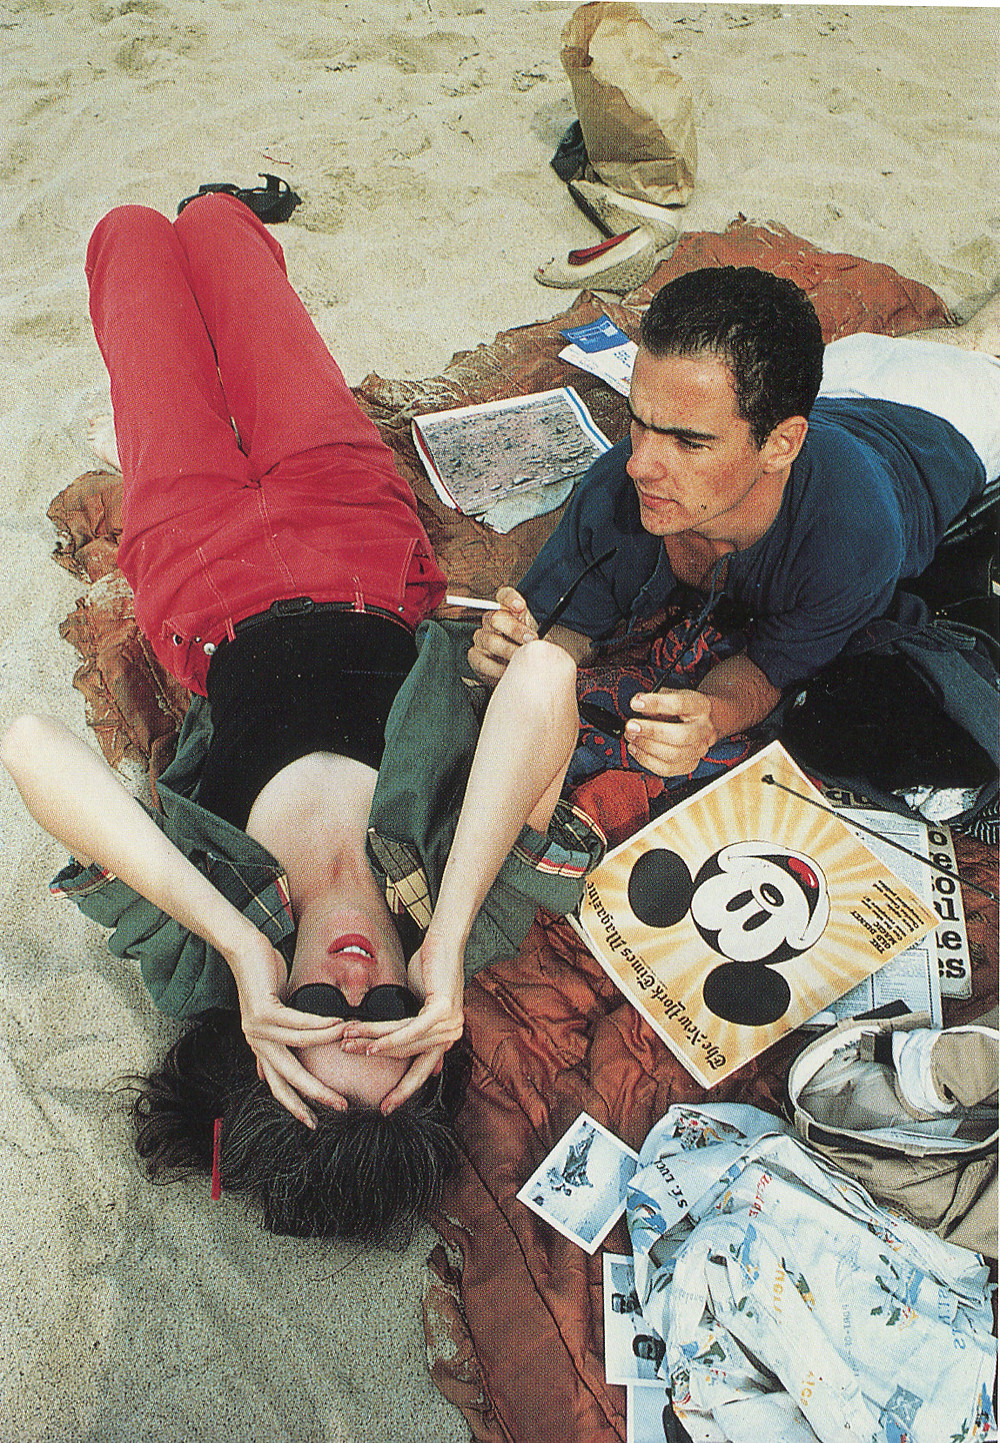 Nan Goldin, CZ and Max on the Beach, Massachusetts, 1976